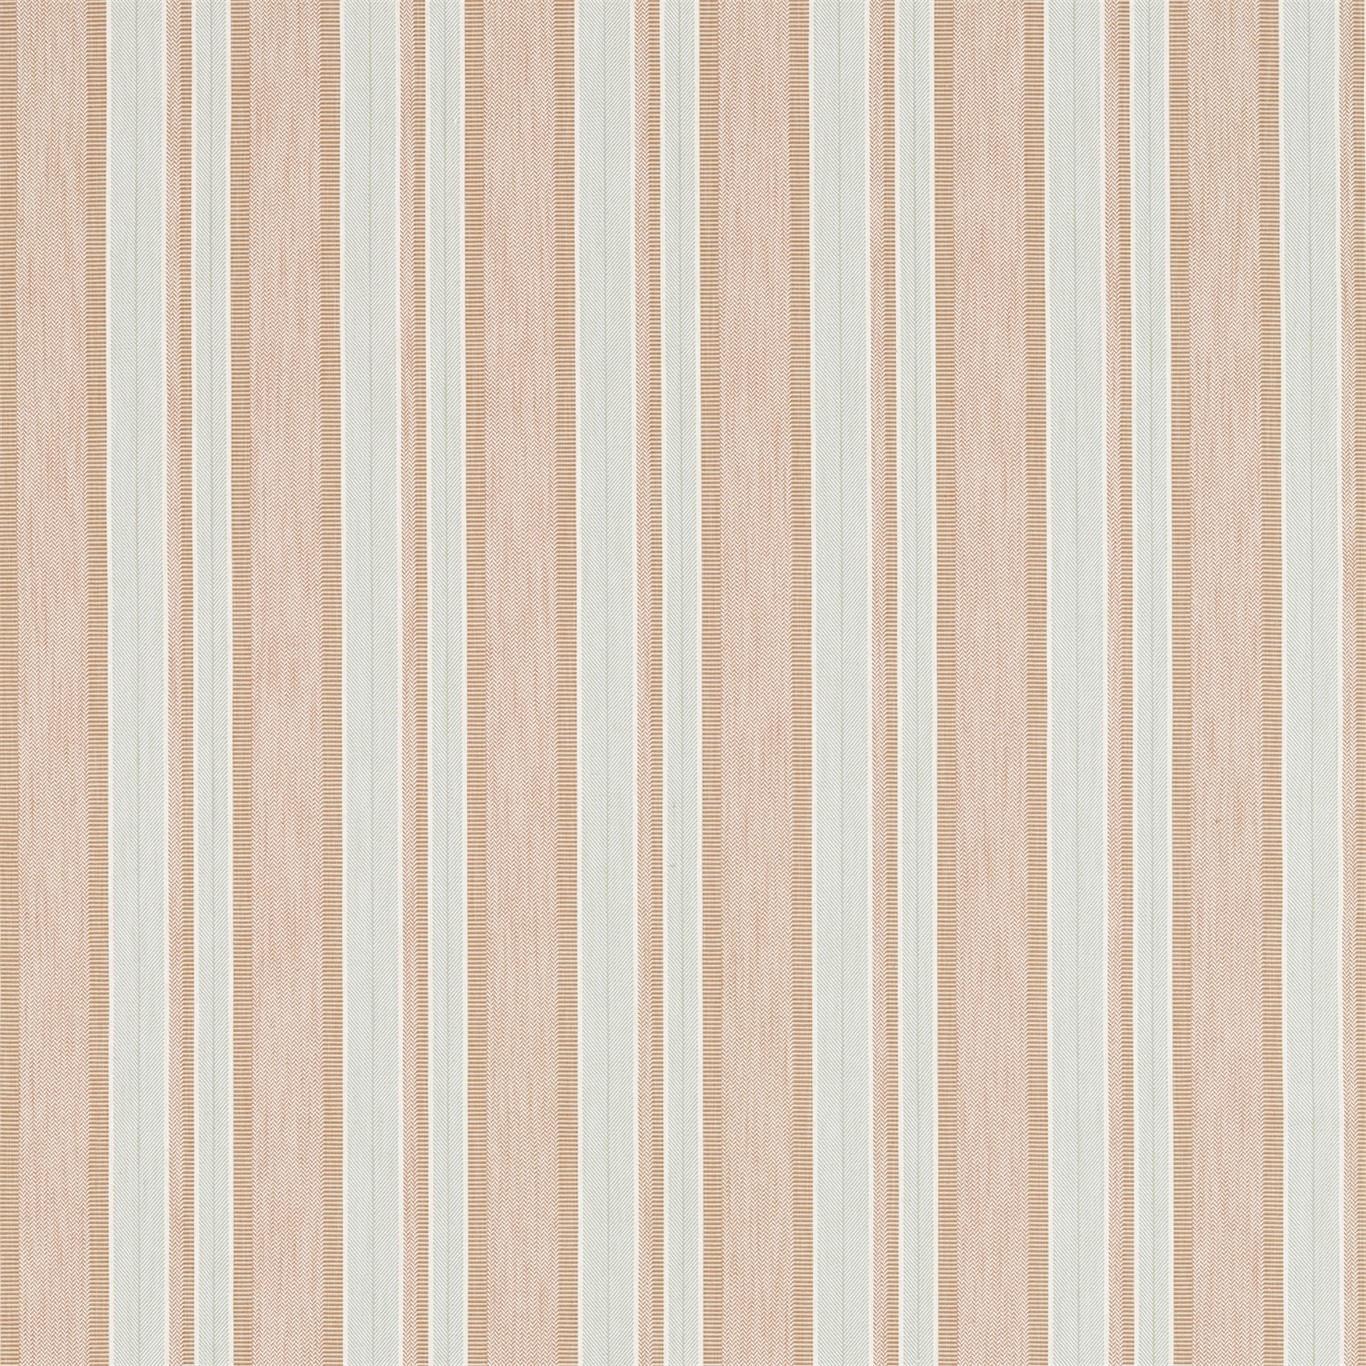 Image of Sanderson Home Alcott Brick/Fennel Fabric 236419